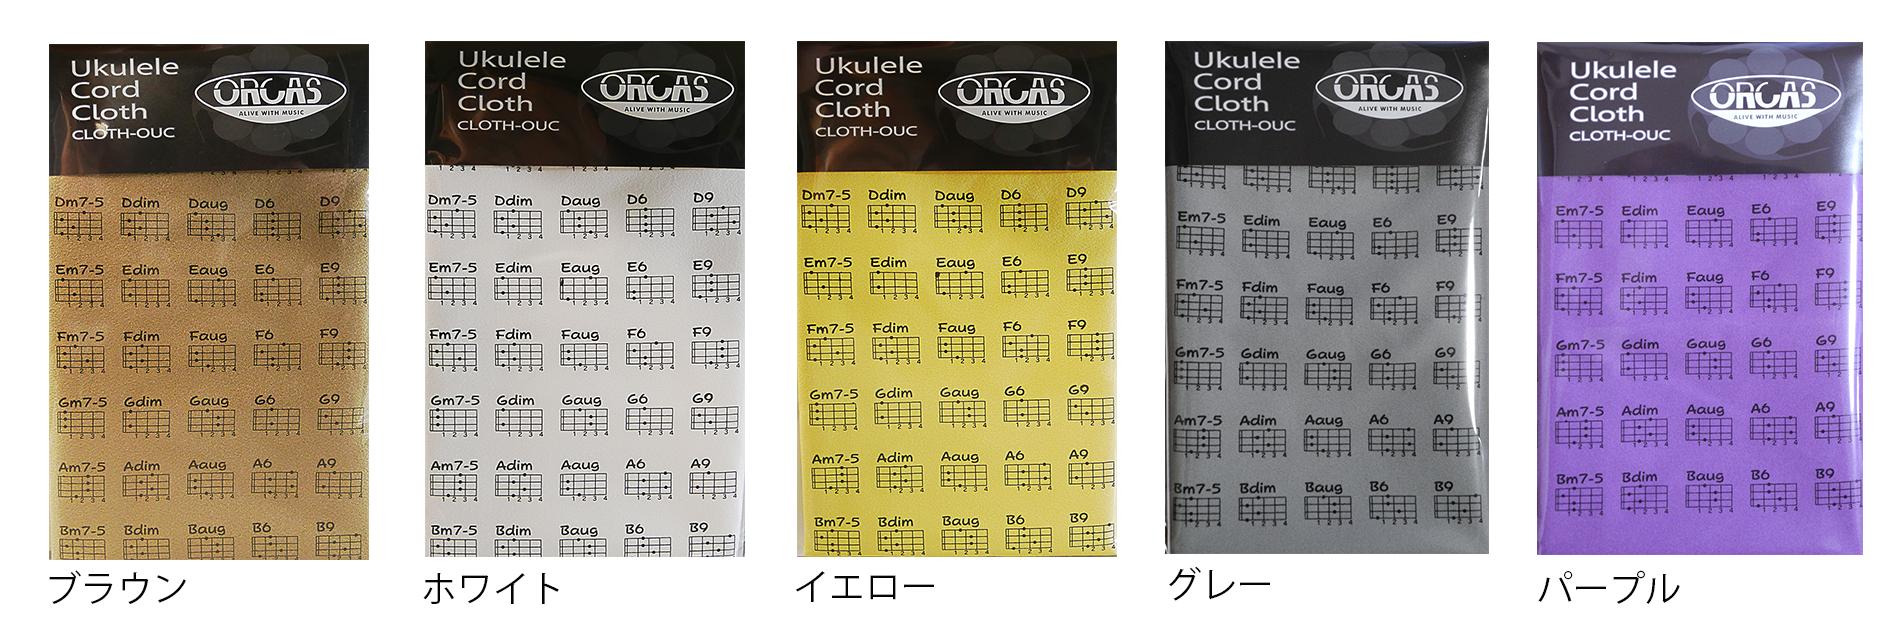 ORCAS ウクレレコード表付クロス※ネコポス対応商品